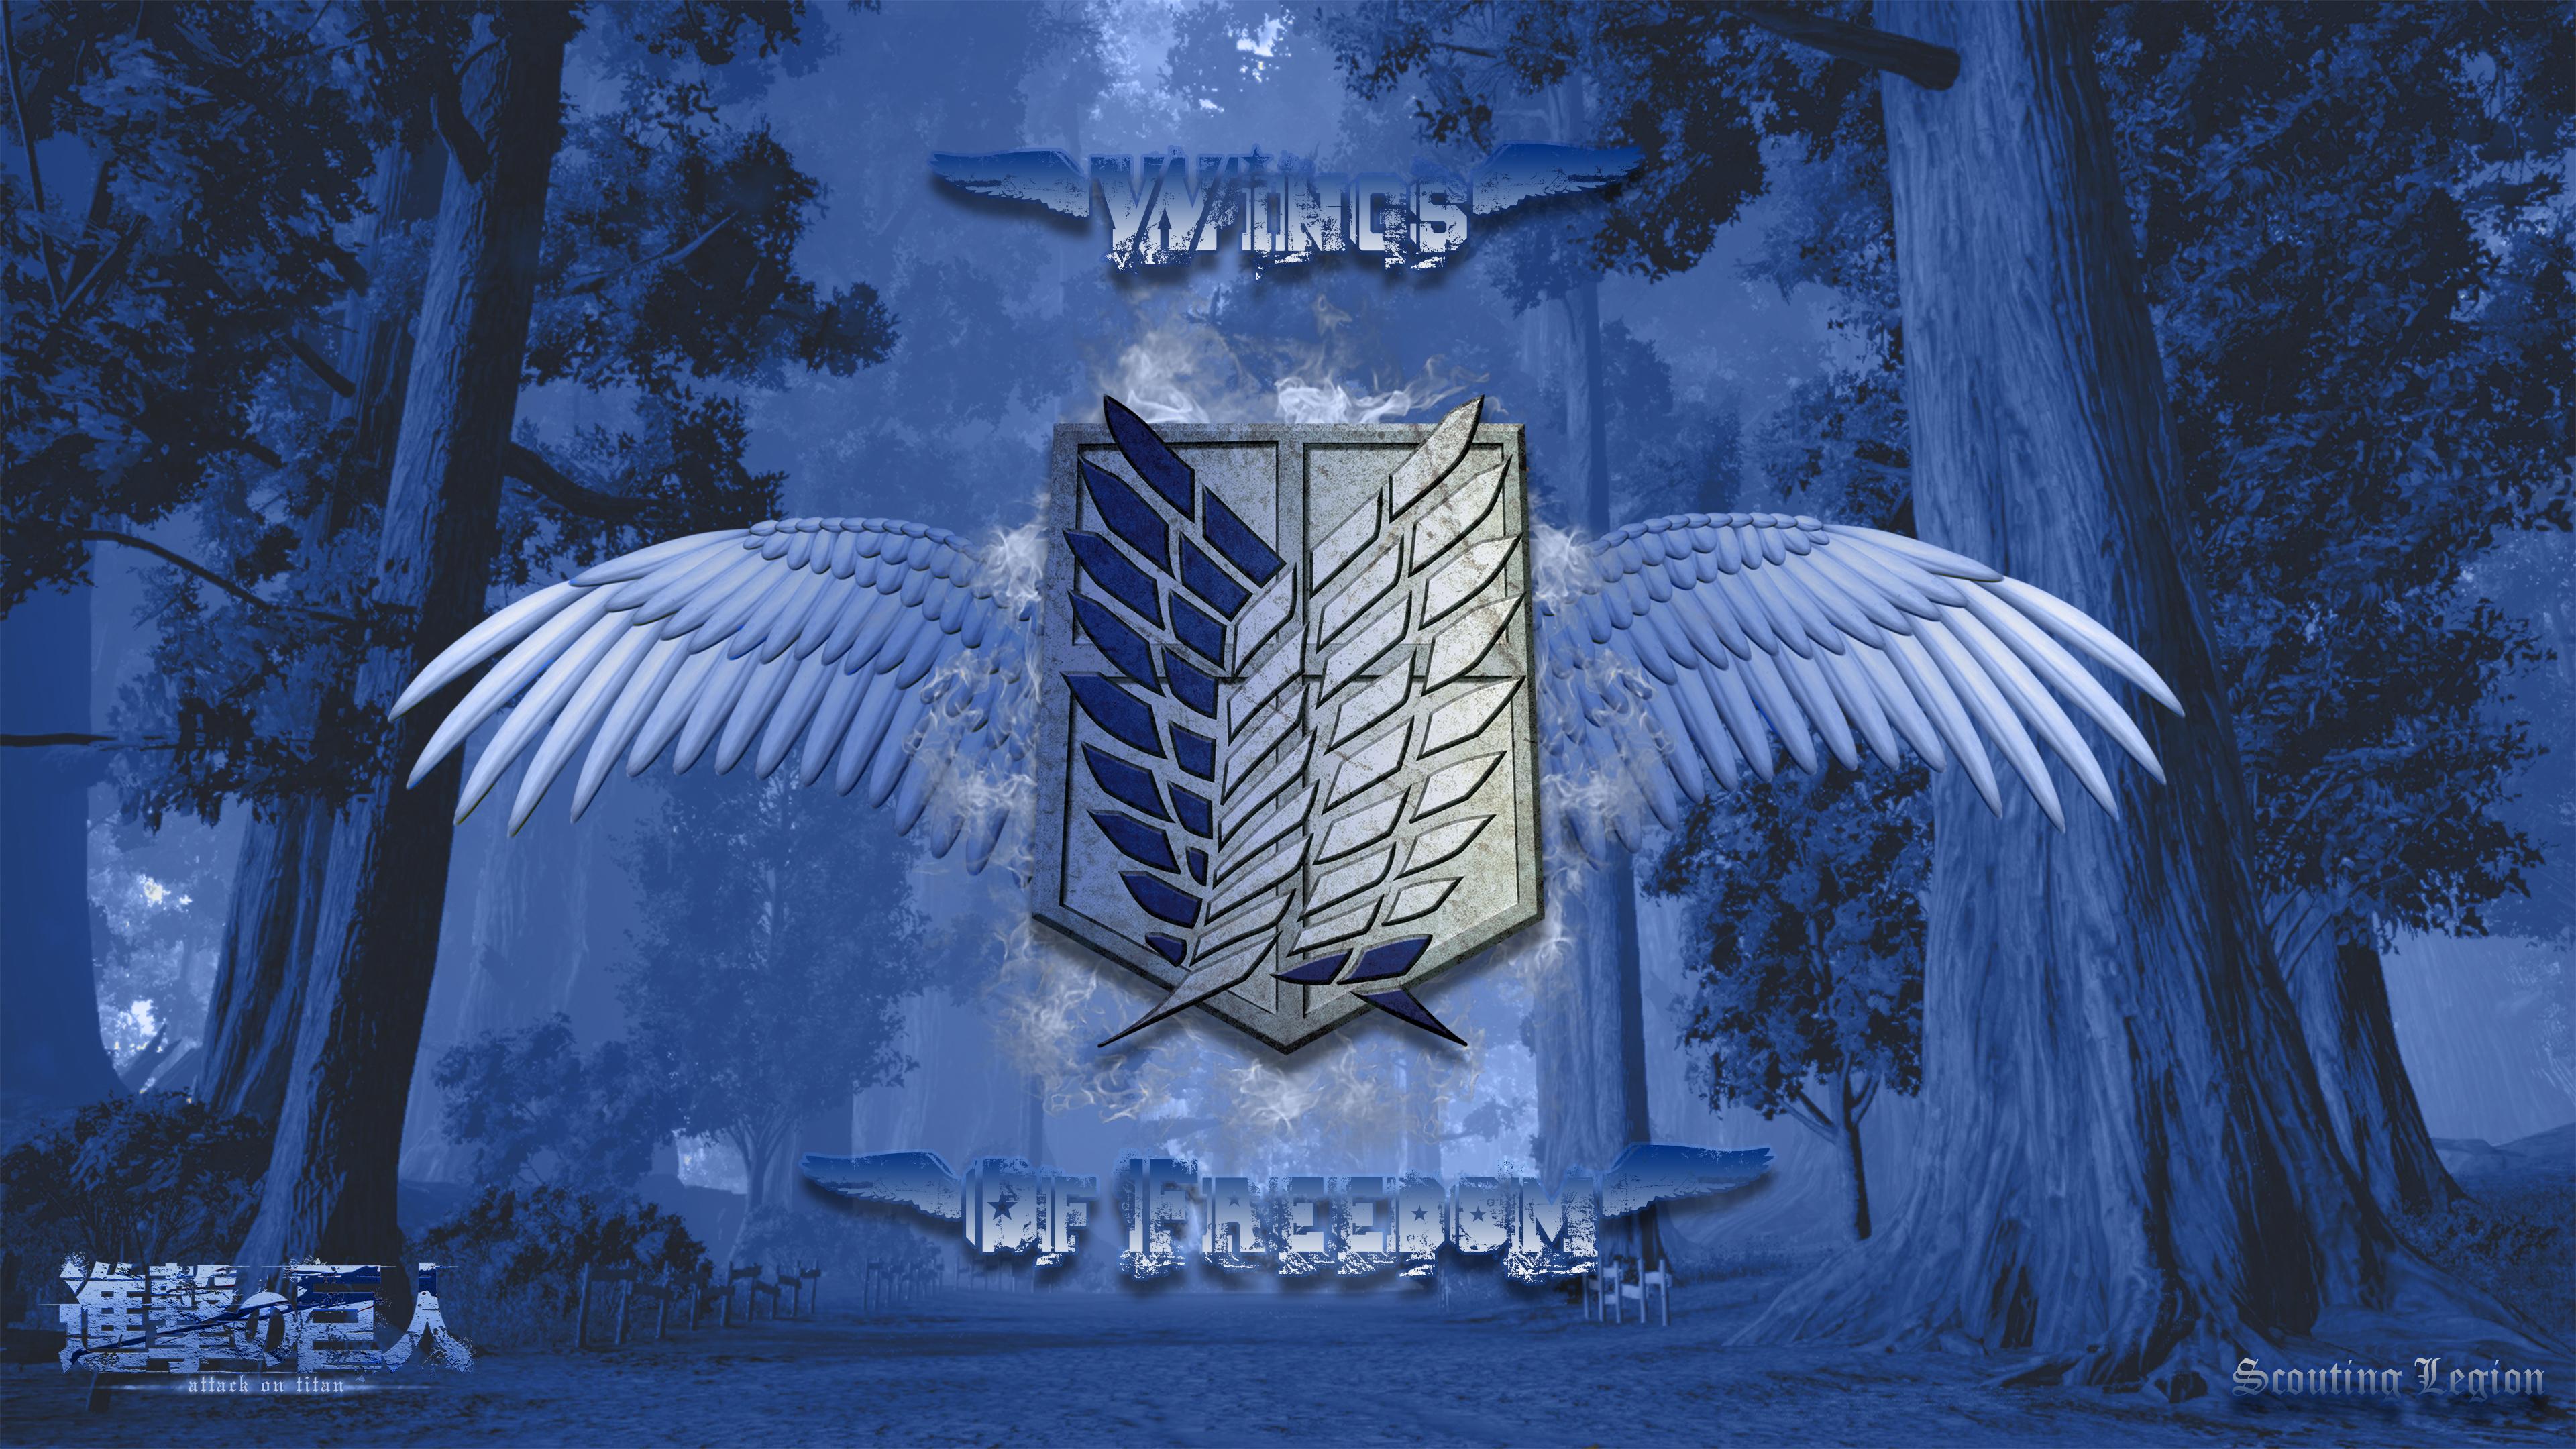 Attack On Titan Scouting Legion Wings Of Freedom Wallpaper Resolution 3840x2160 Id 314061 Wallha Com